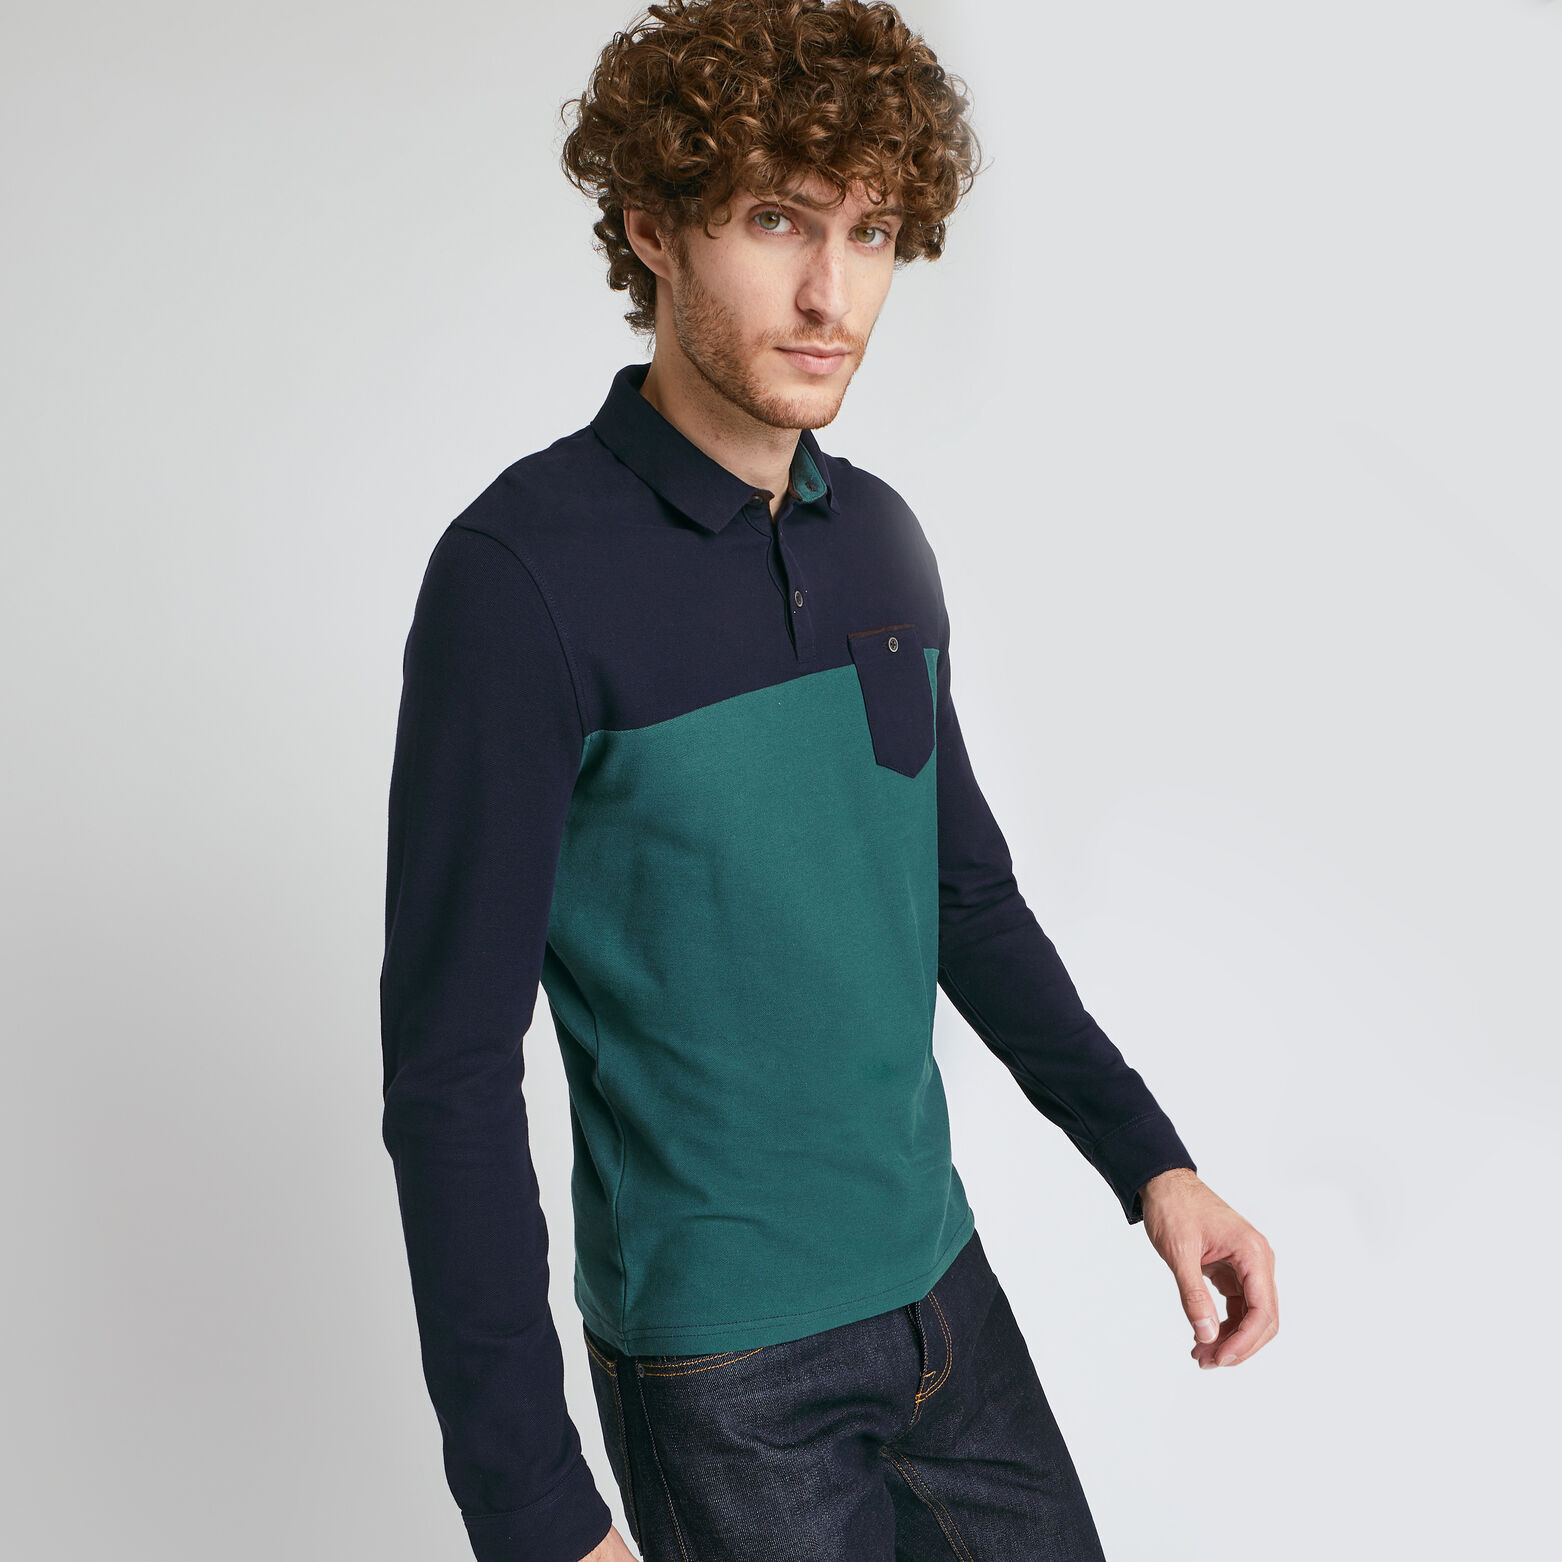 Ensemble polo pantalon ceinture